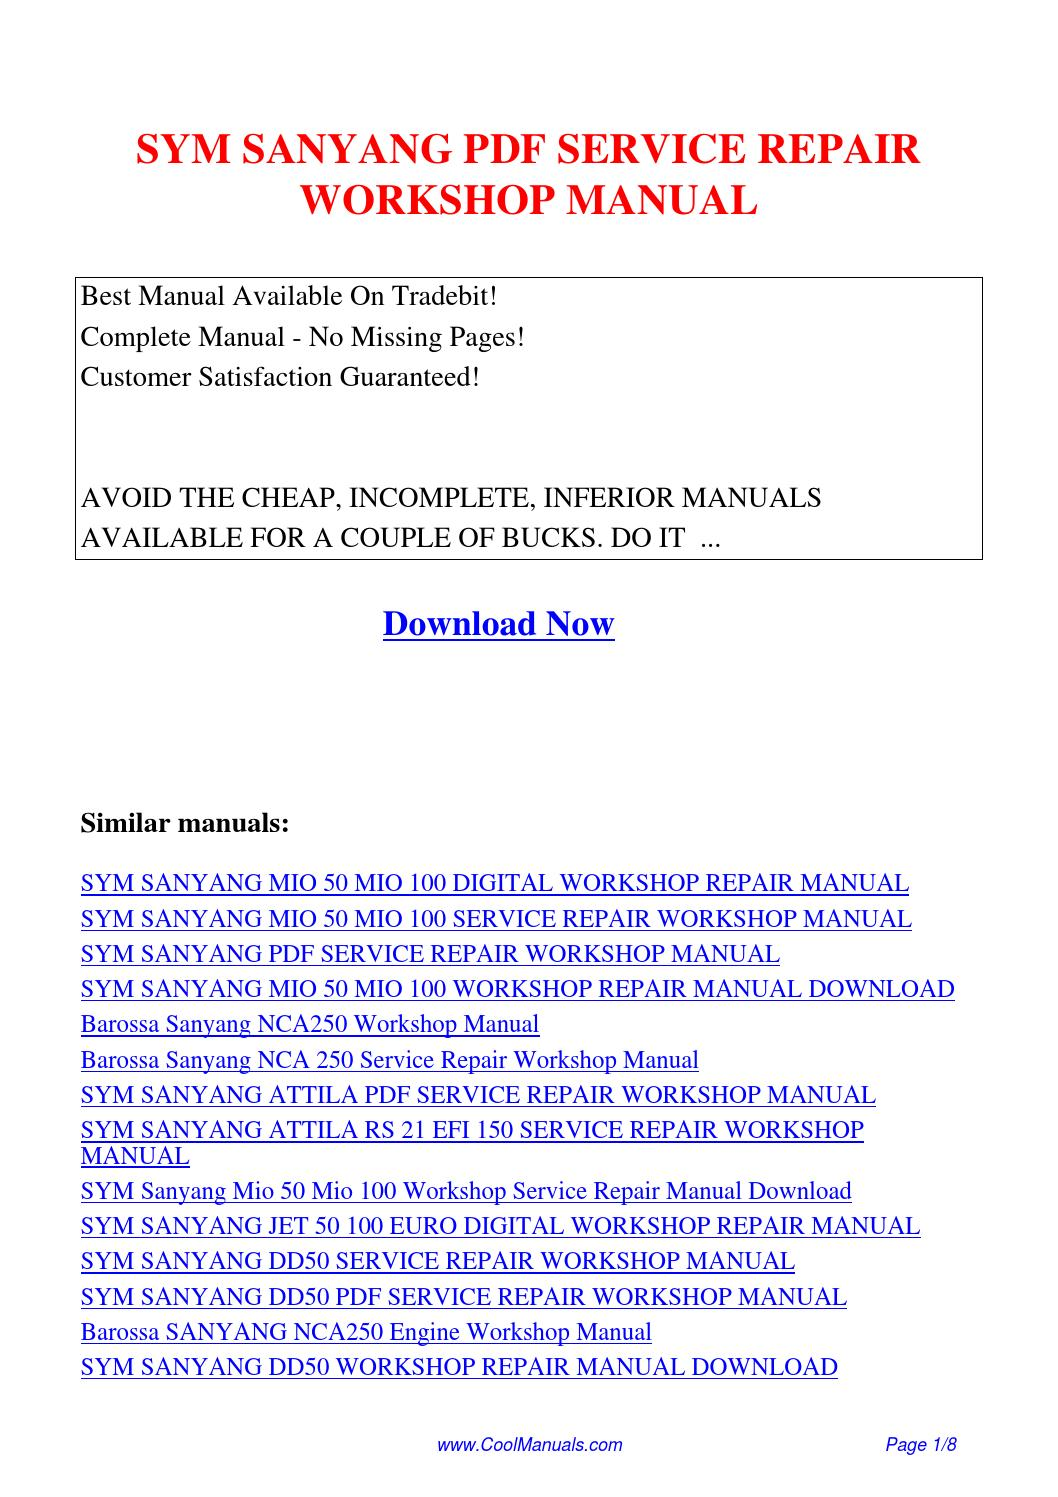 Sym Sanyang Service Repair Workshop Manual Pdf By Guang Hui Issuu